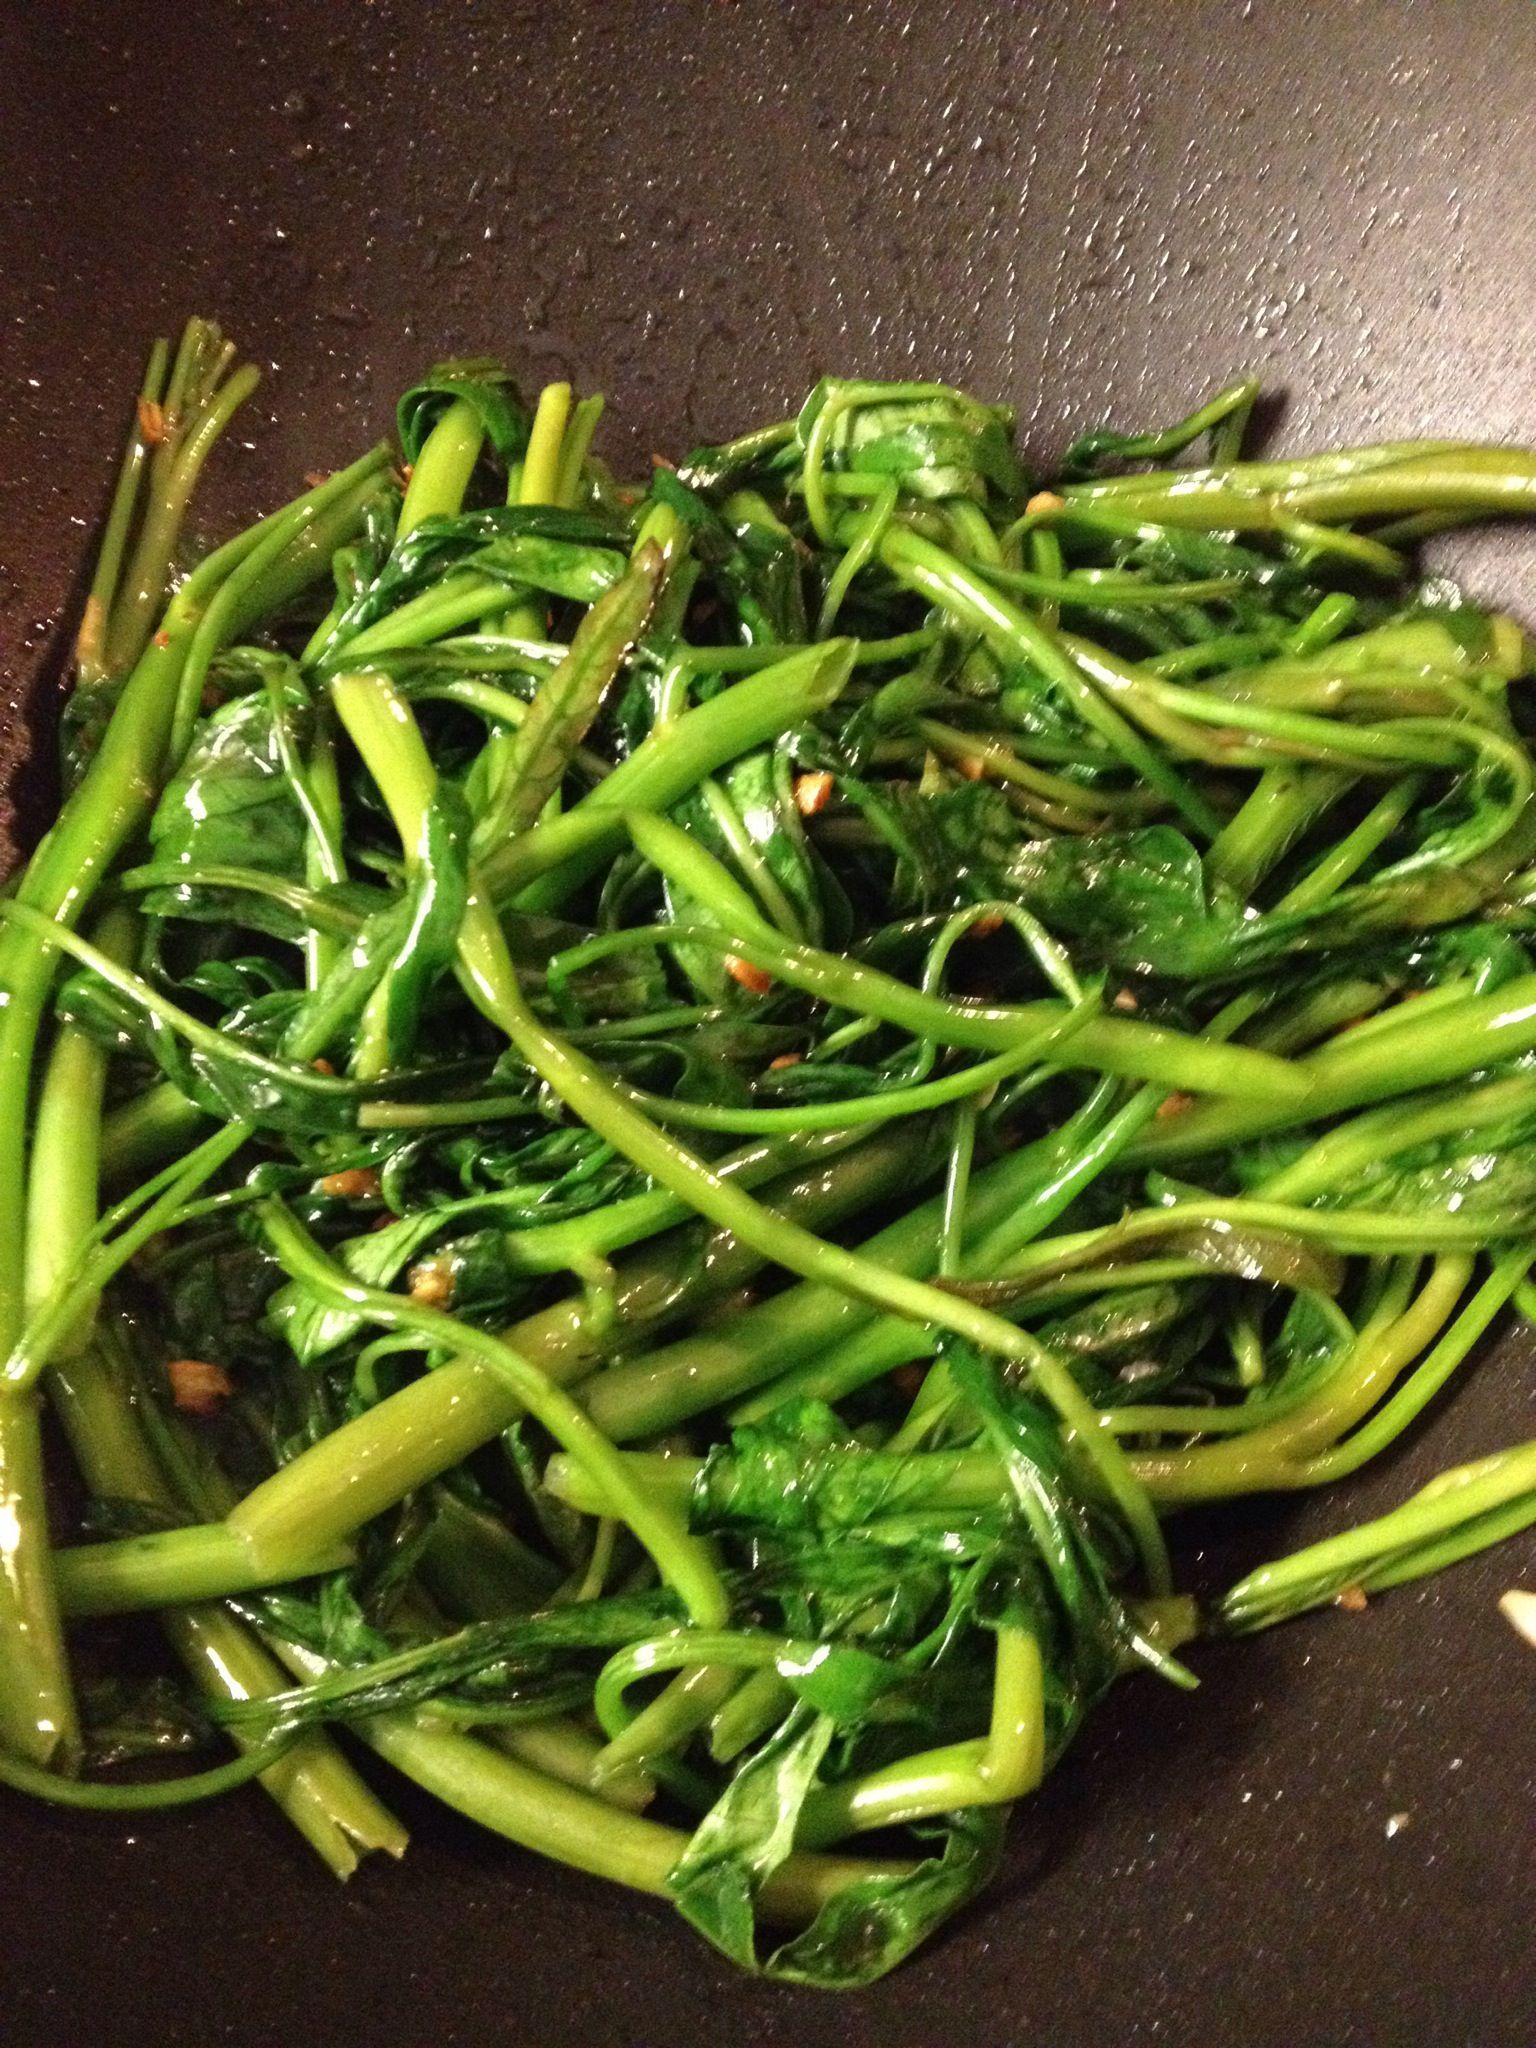 Morning Glory Vegetable : morning, glory, vegetable